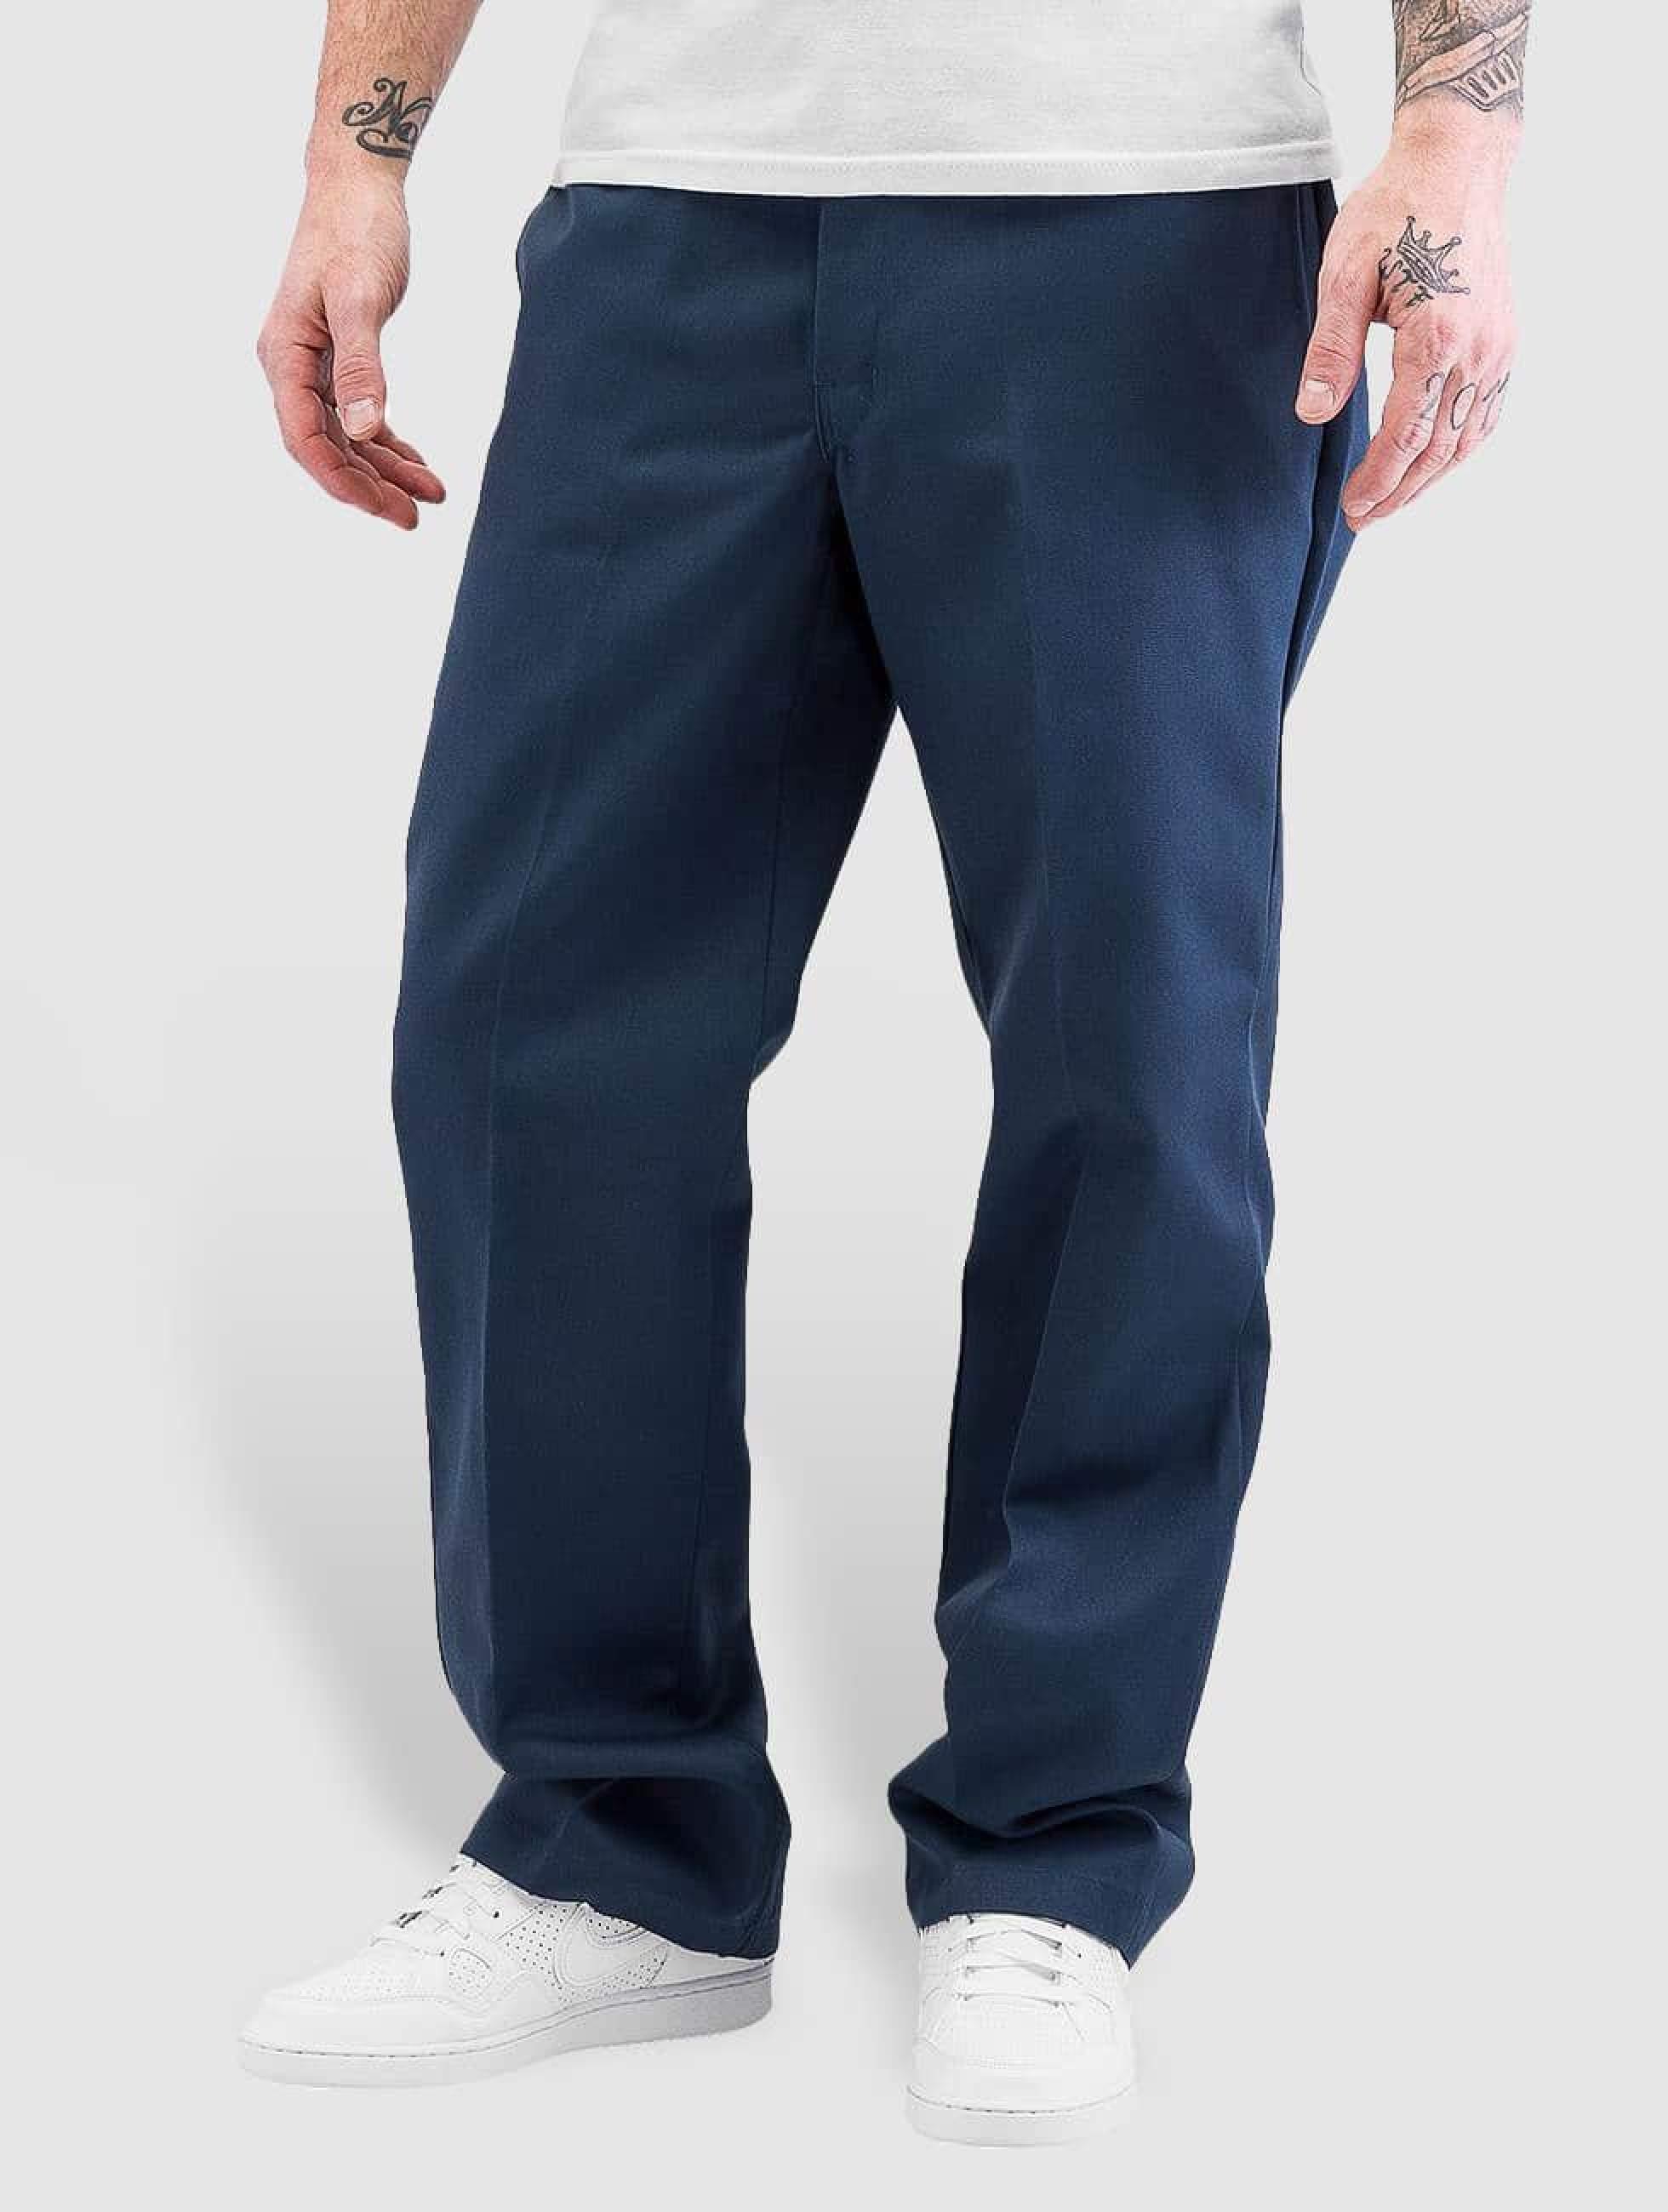 Pantalon 874 221166 Chino DickiesOriginal Bleu Work Homme OPkXZTiu